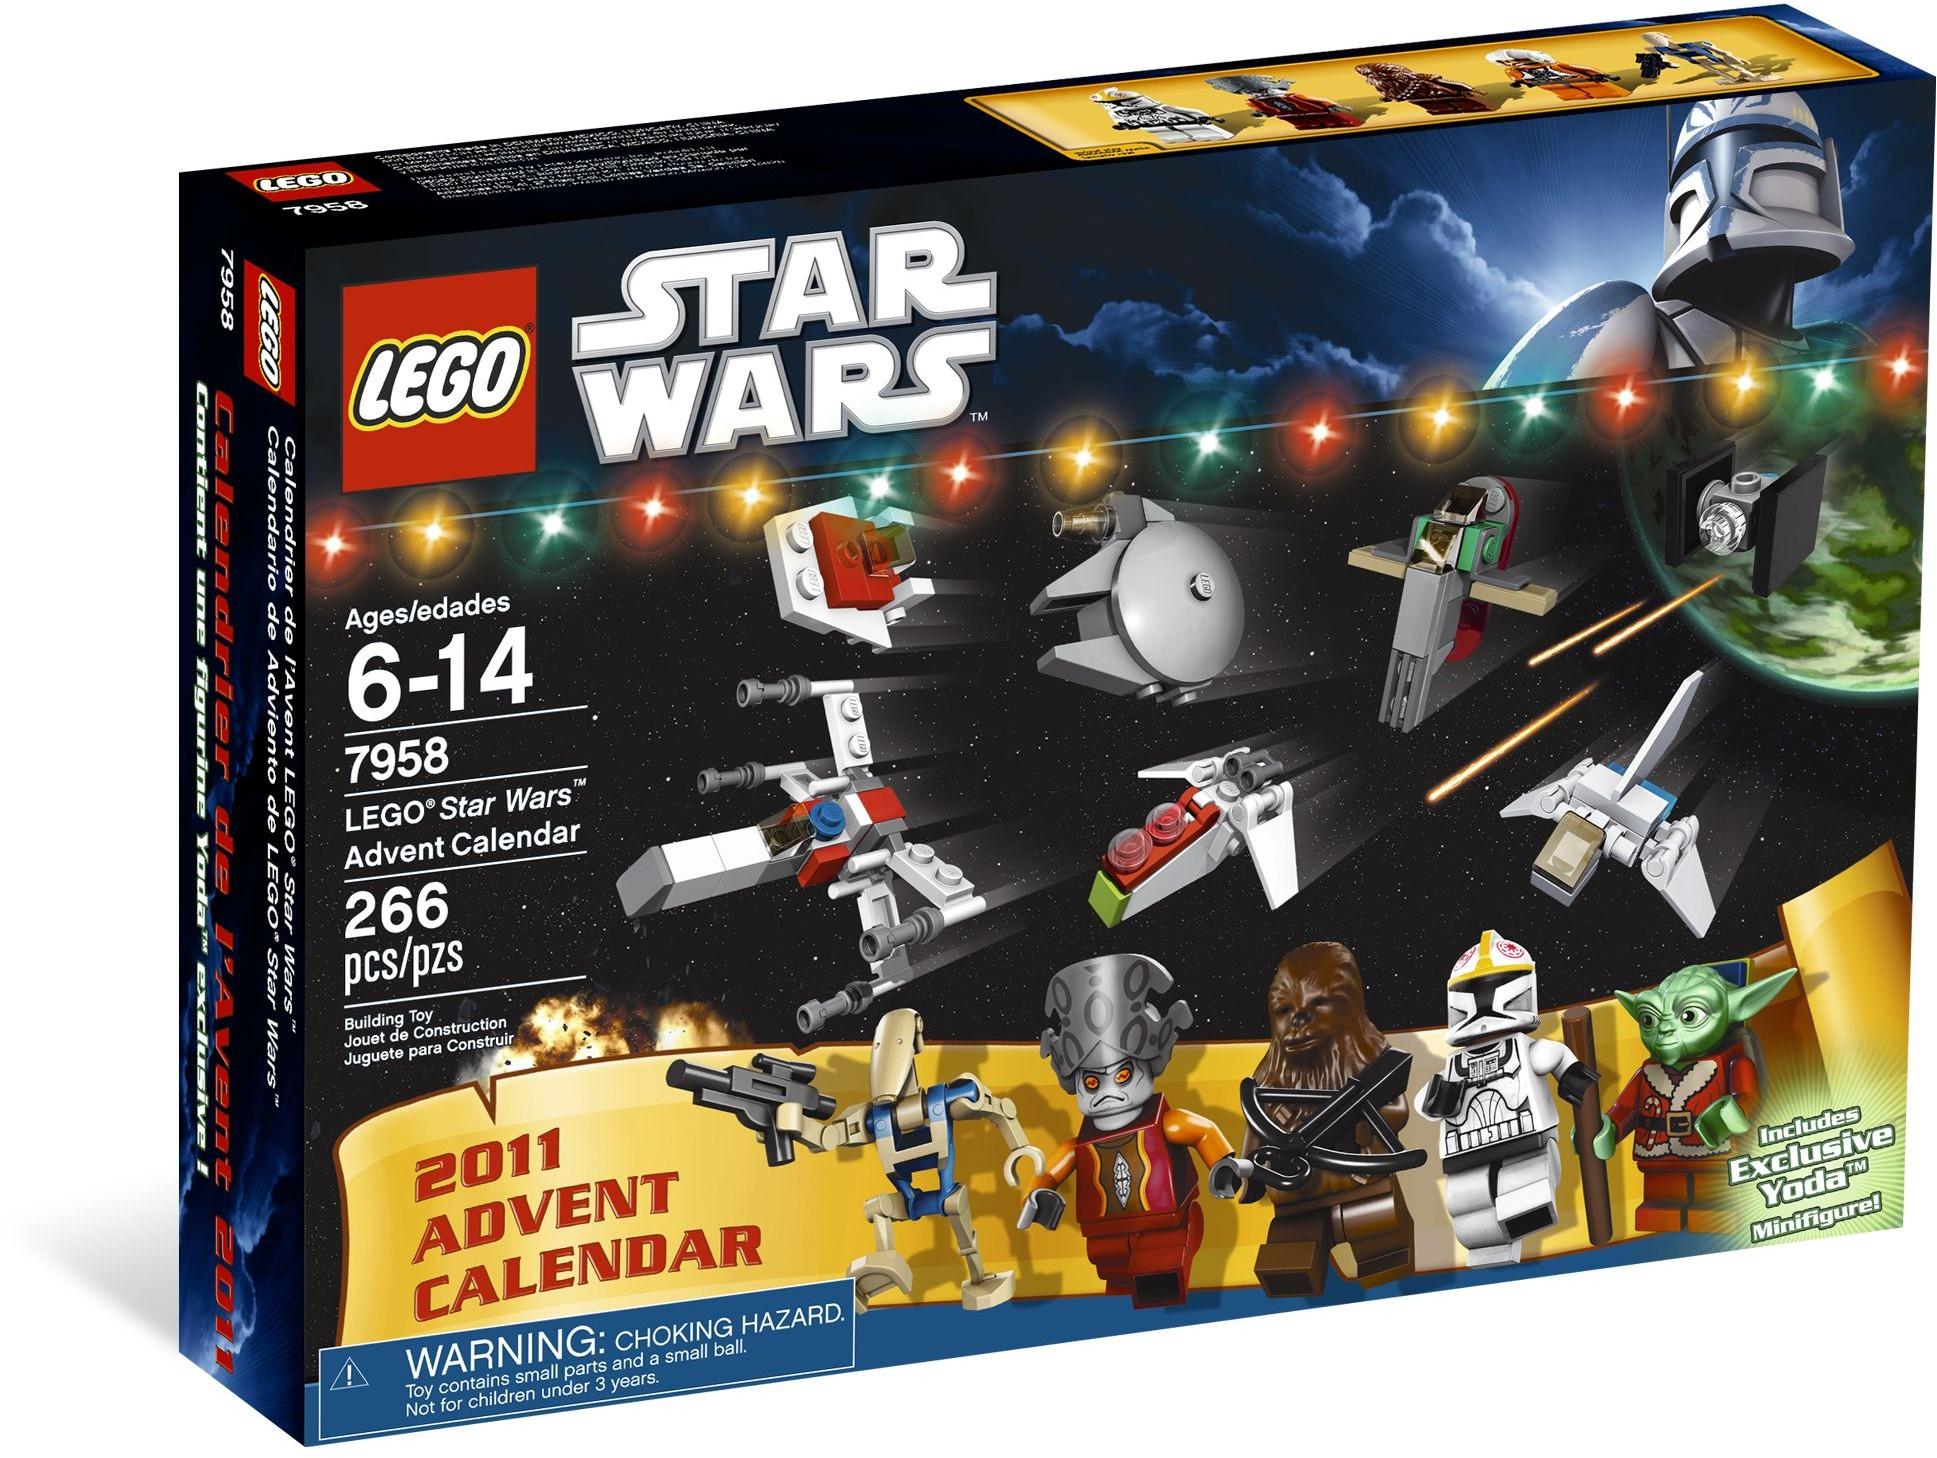 7958 star wars advent calendar 2011